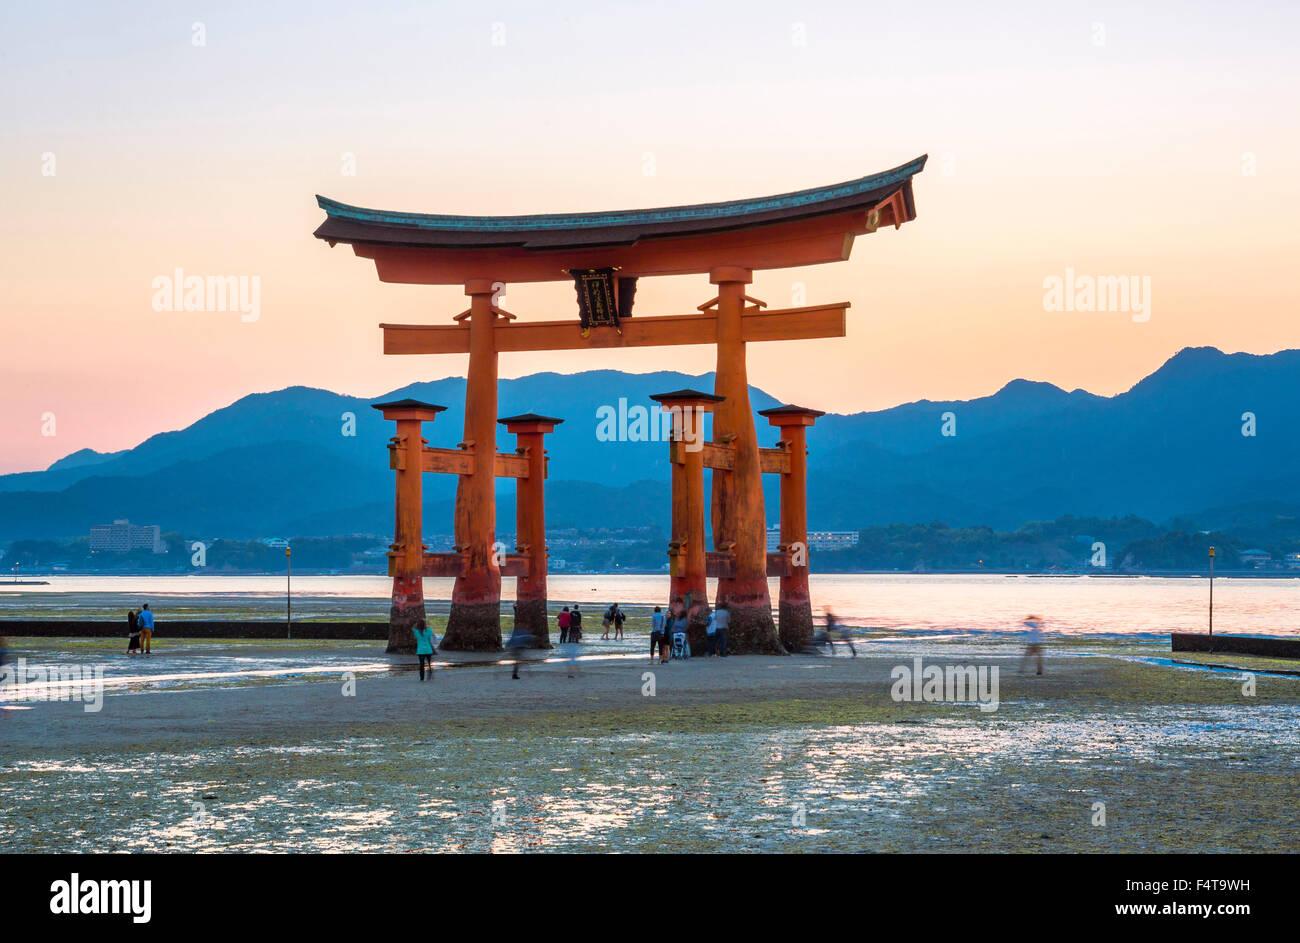 Le Japon, Hiroshima, l'île de Myajima Province, Utsukushima de culte, la porte Photo Stock